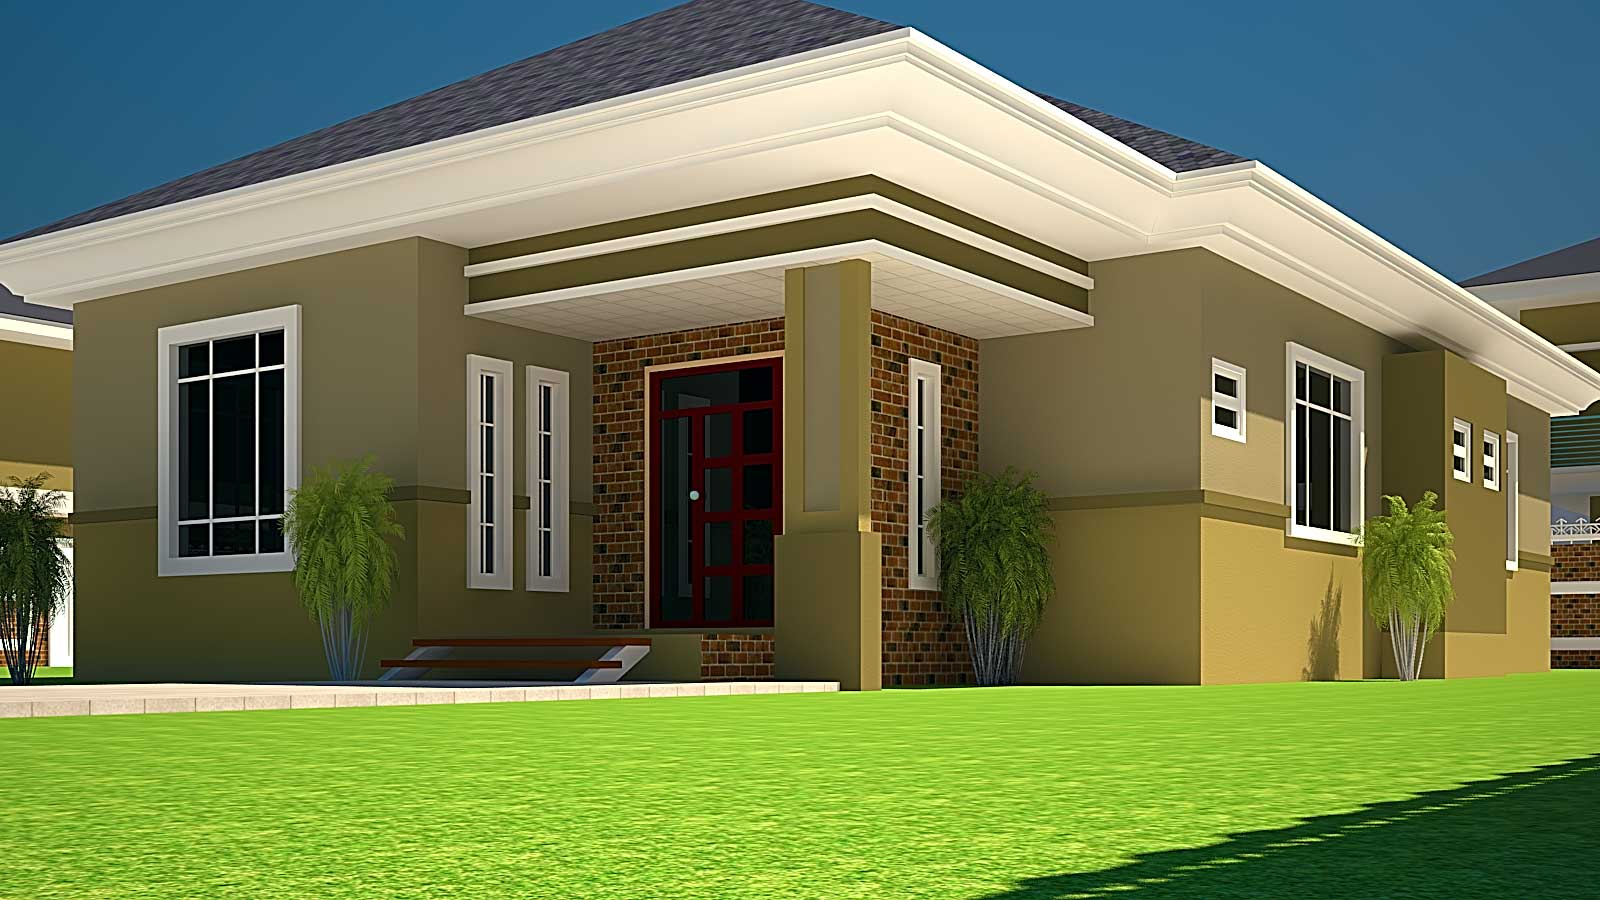 House Plans Ghana Bedroom Plan Half Plot House Plans 48742